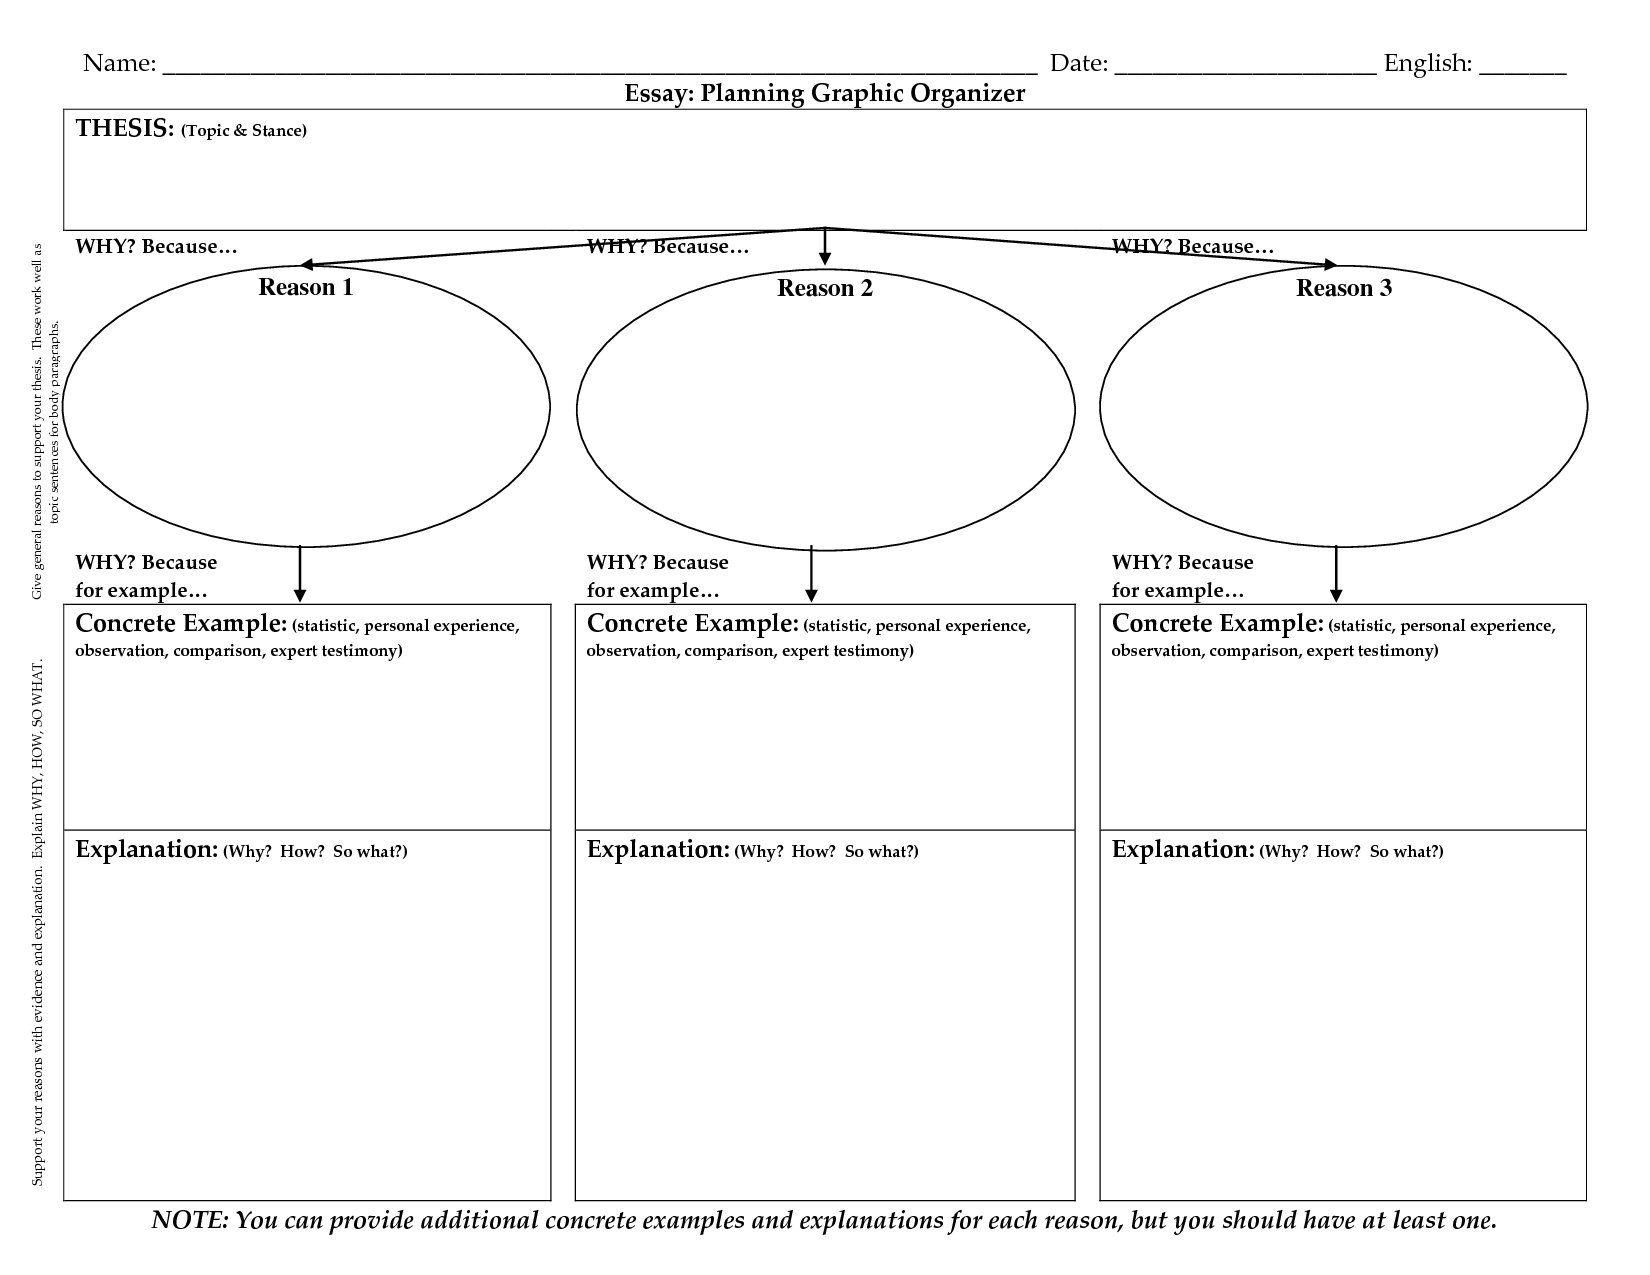 Essay Graphic Organizer For High School